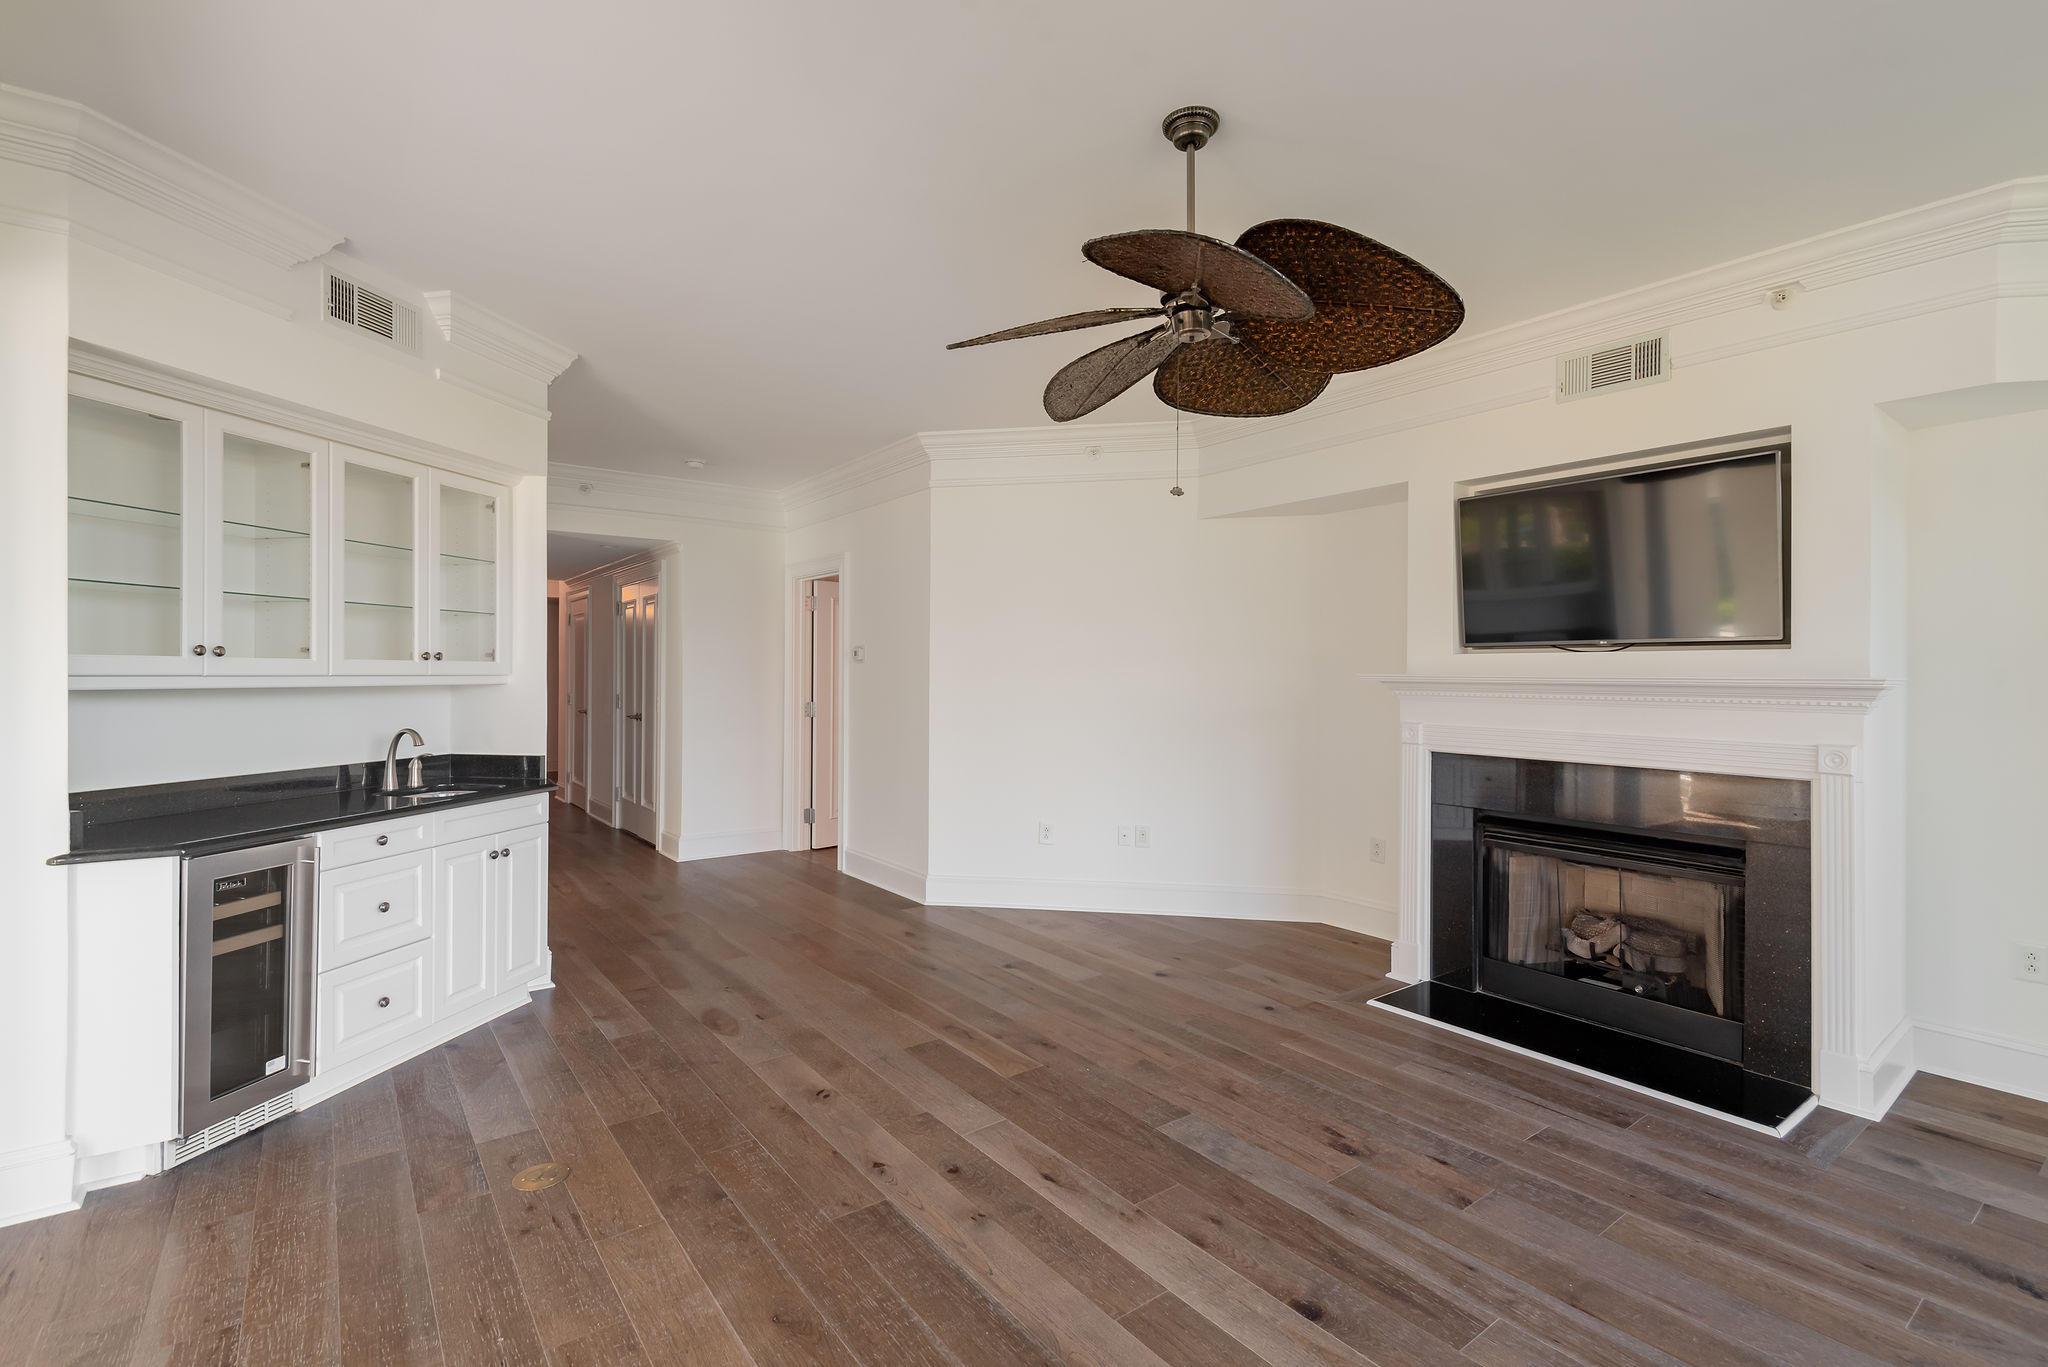 Renaissance On Chas Harbor Homes For Sale - 211 Plaza, Mount Pleasant, SC - 9